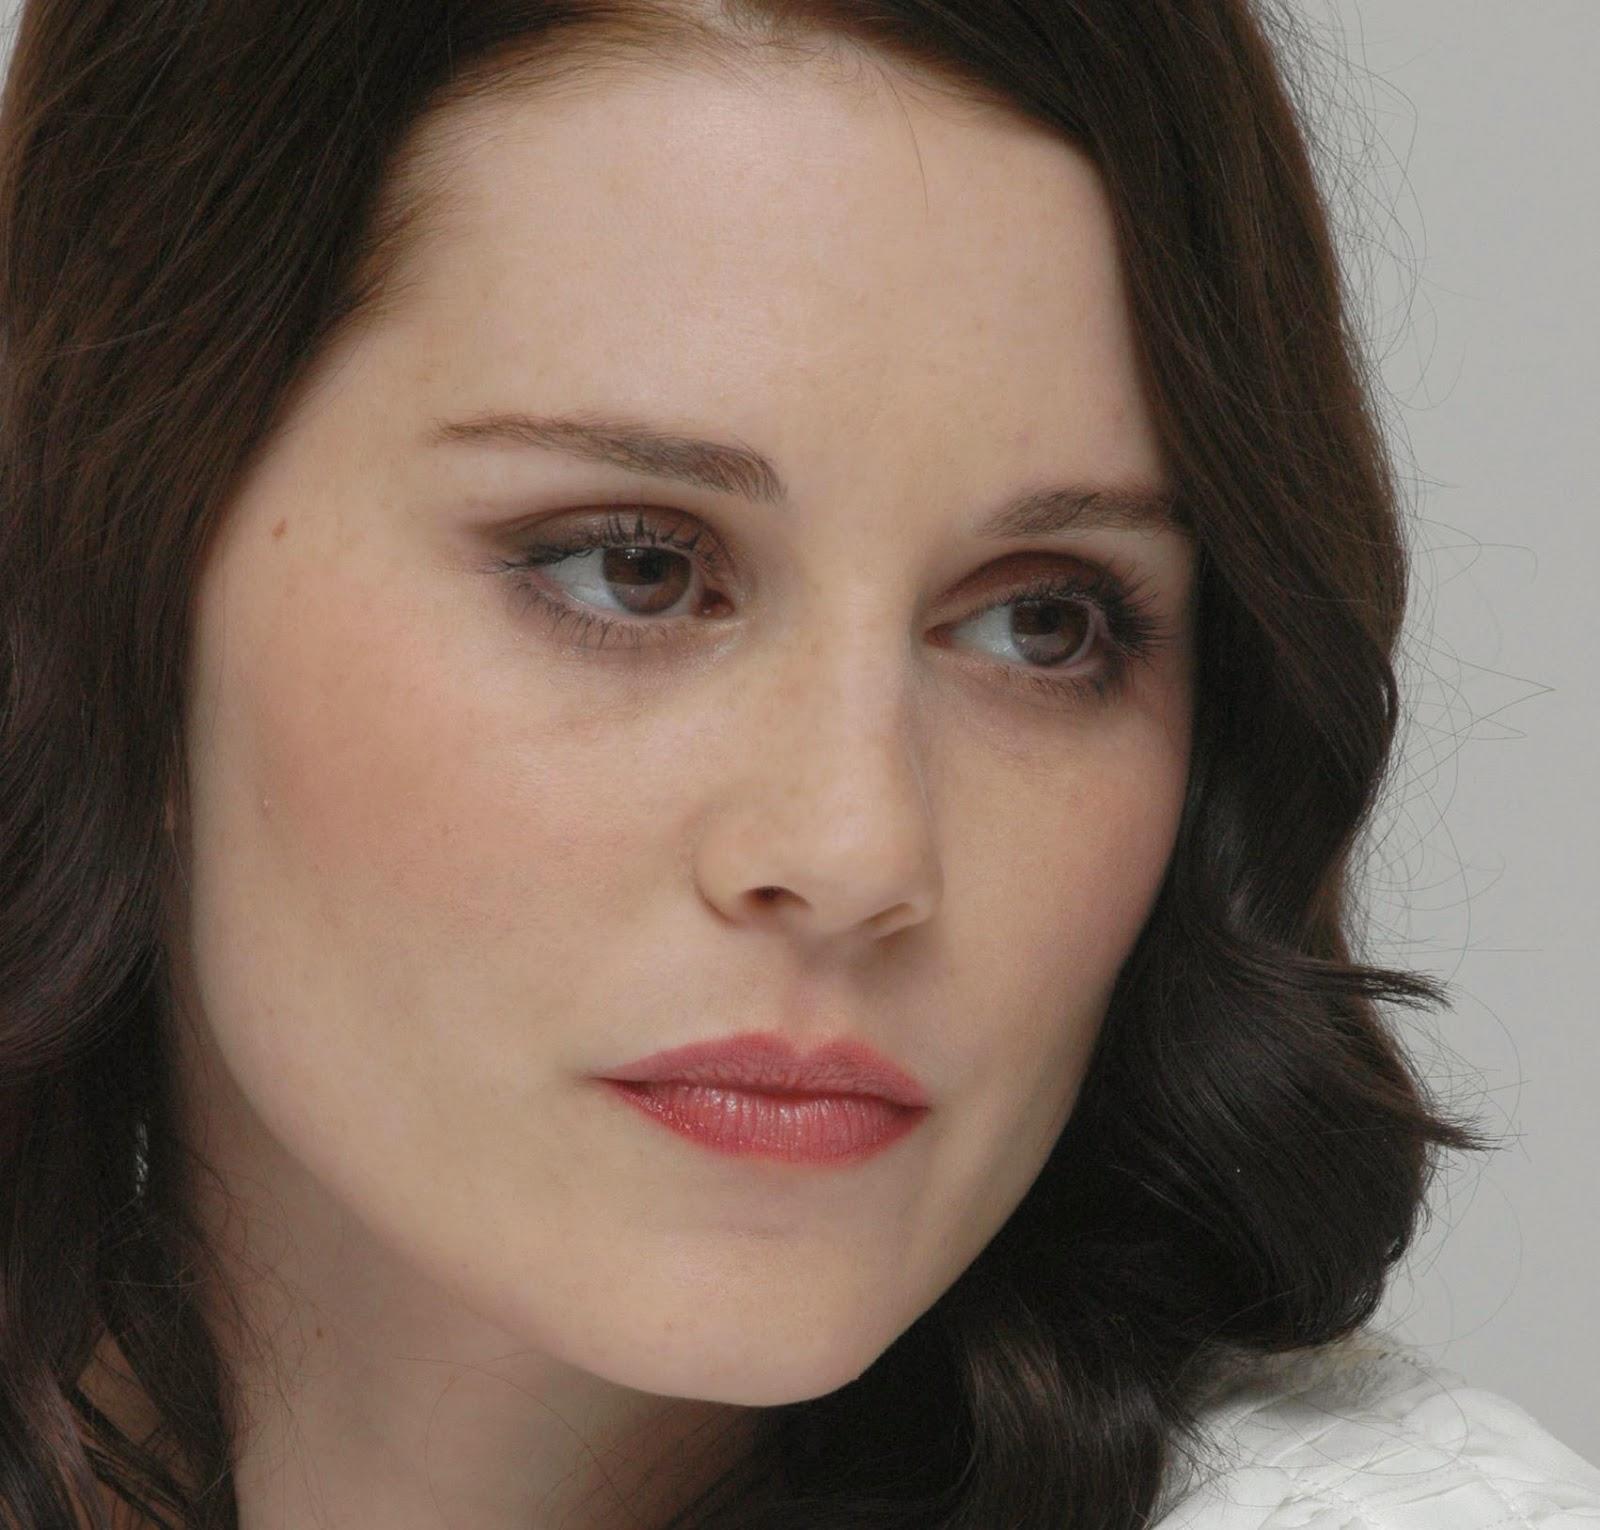 Hollywood Actress Wallpaper: Alison Lohman Wallpapers Free